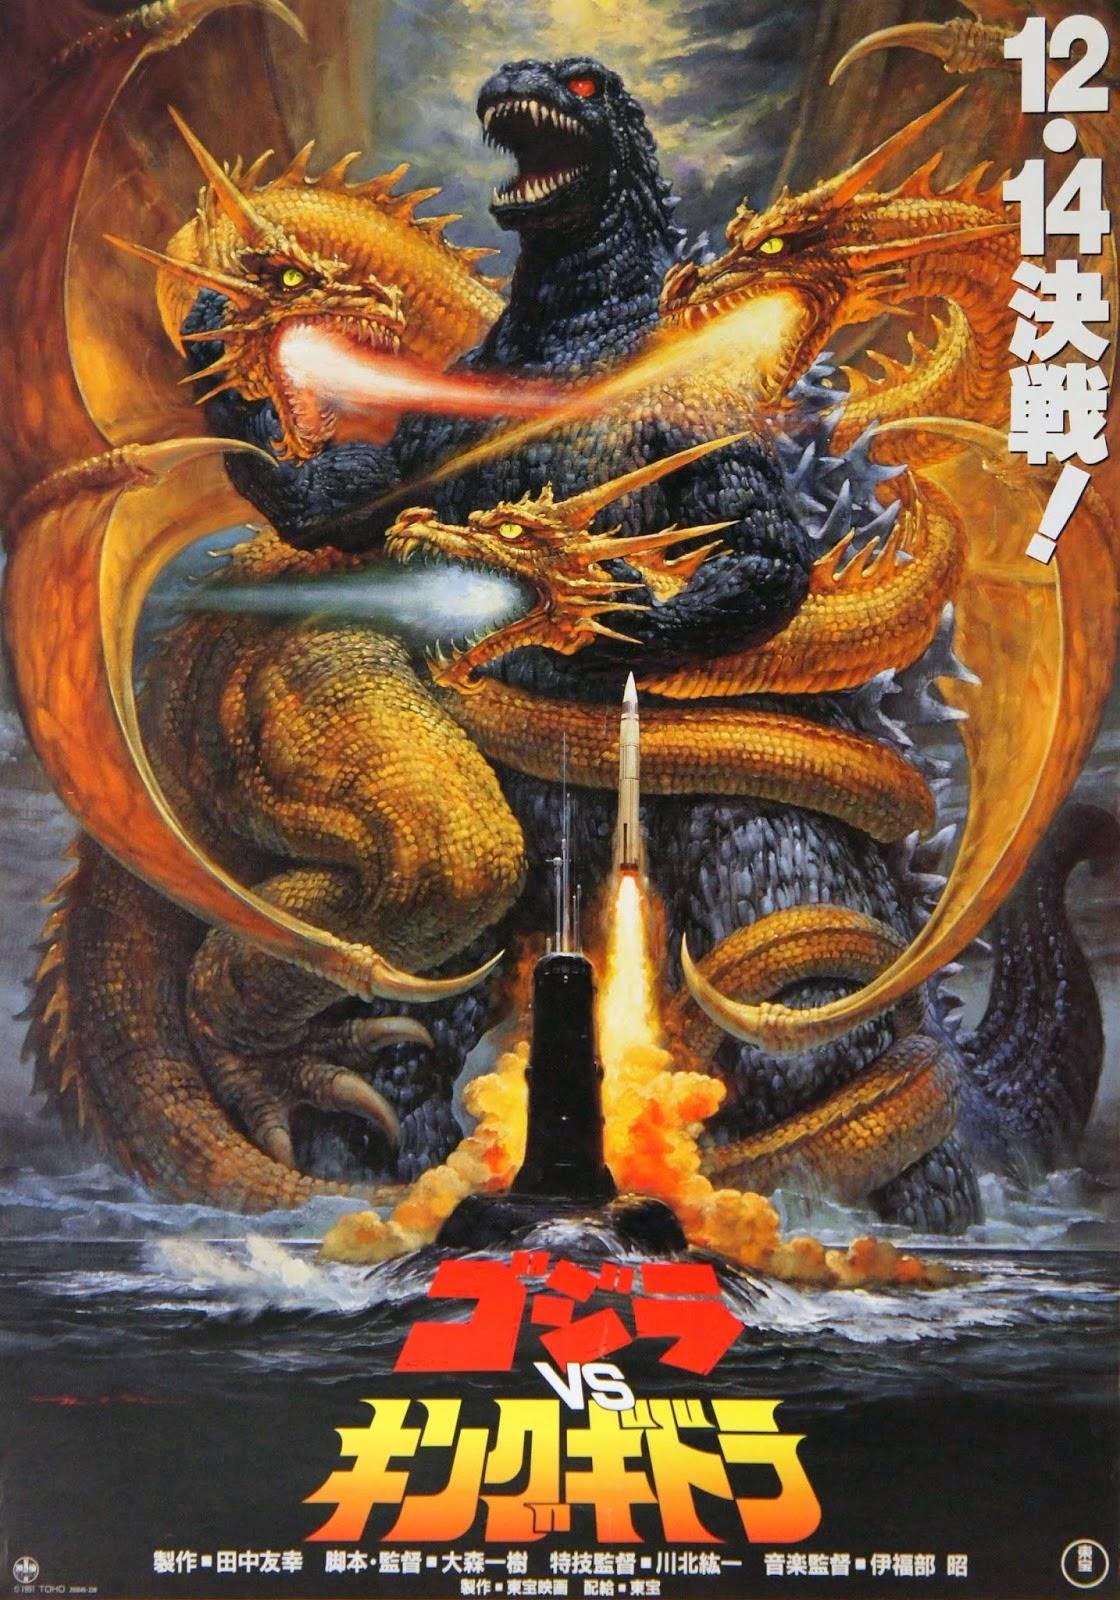 http://fr.wikipedia.org/wiki/Godzilla_vs_King_Ghidorah